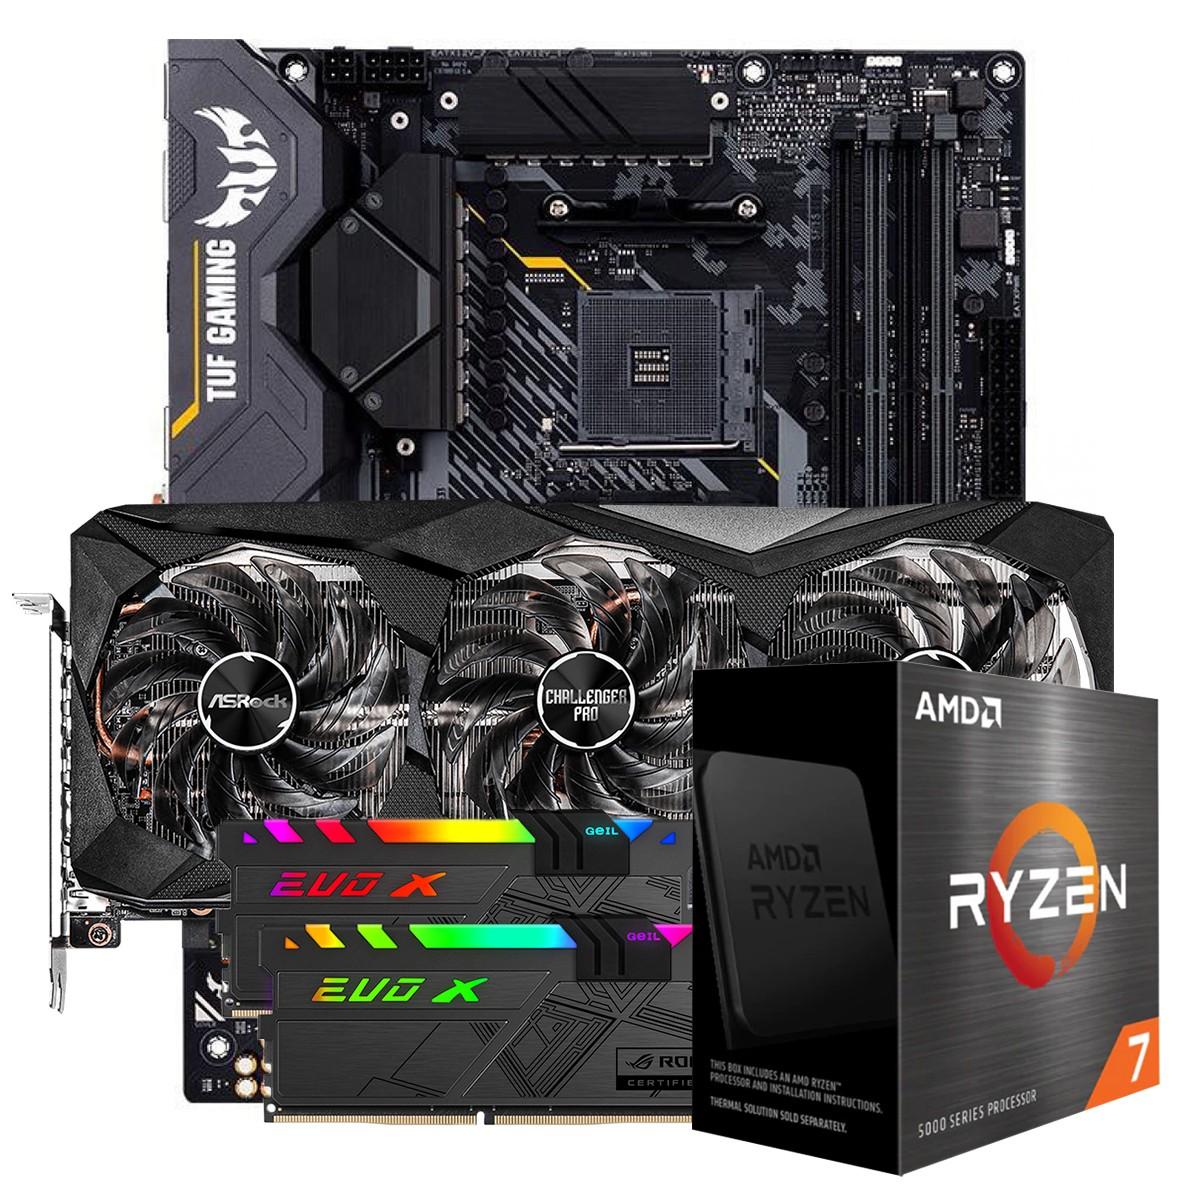 Kit Upgrade ASRock Radeon RX 6700 XT Challenger Pro OC + AMD Ryzen 7 5800X + ASUS TUF Gaming X570-Plus + Memória DDR4 16GB (2x8GB) 3600MHz